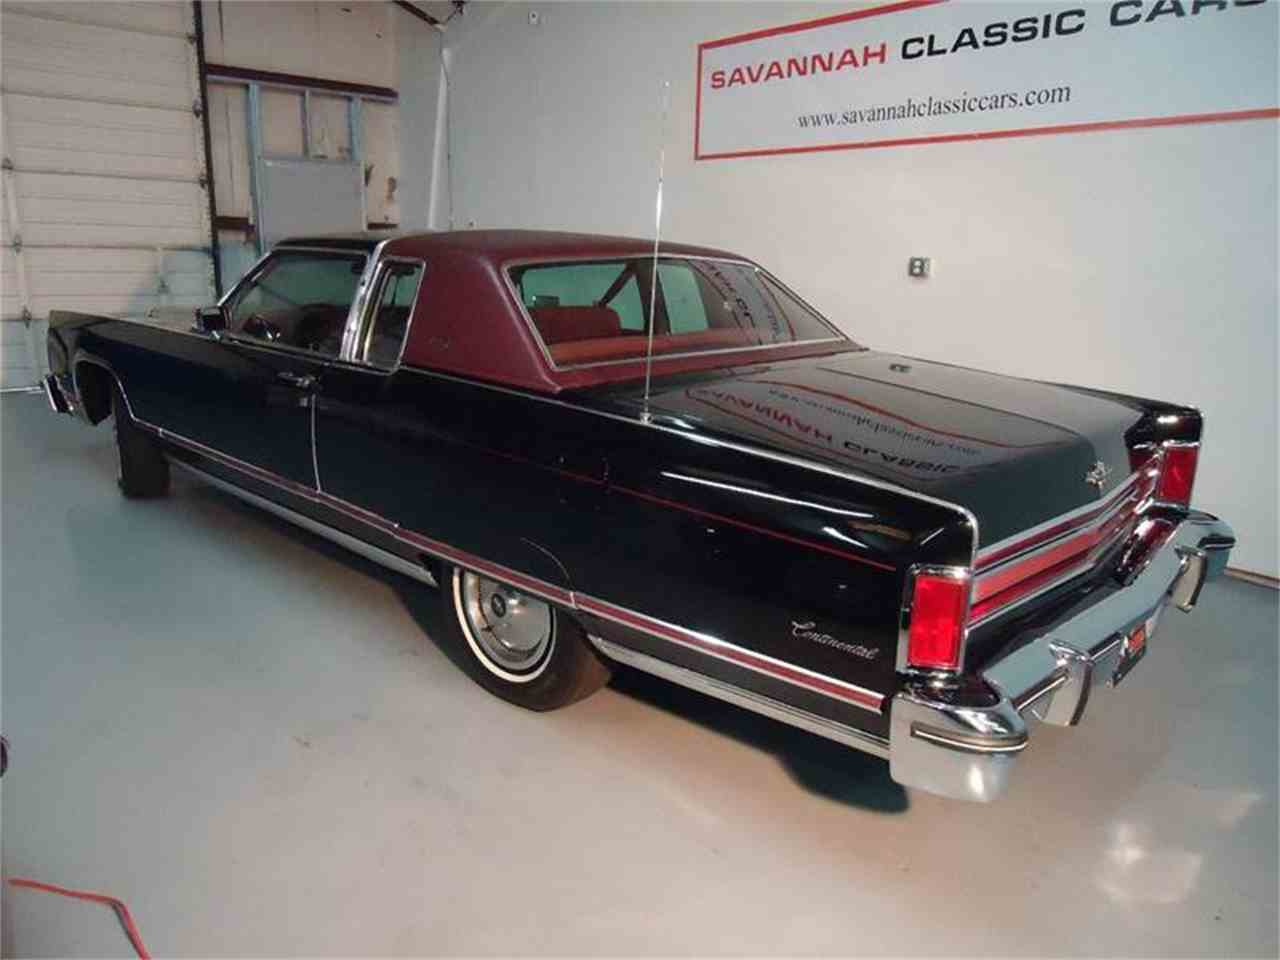 Cars For Sale Savannah Ga: 1976 Lincoln Town Car For Sale